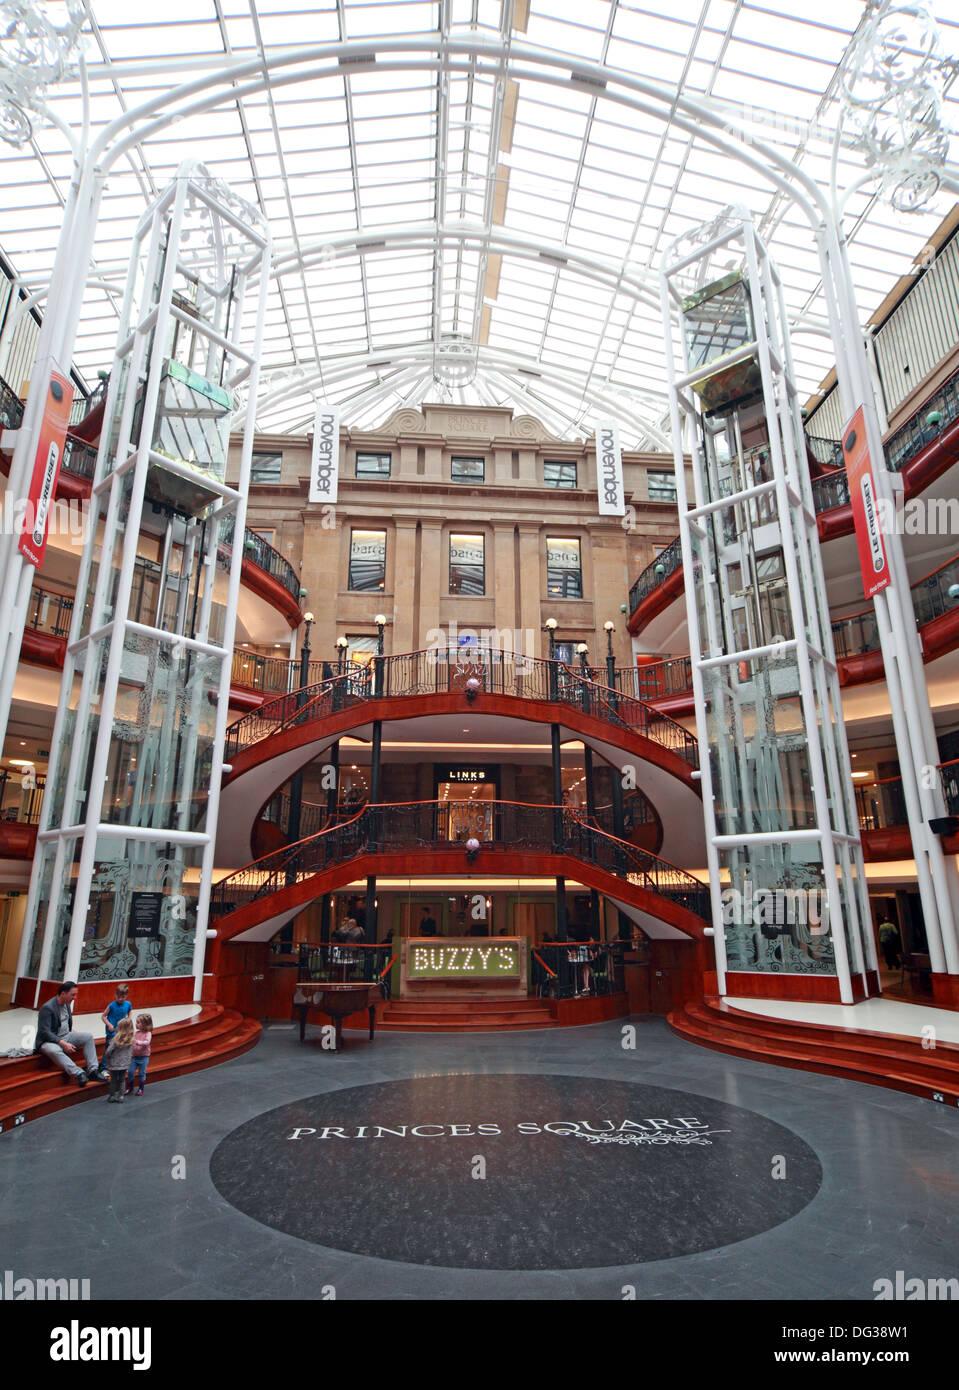 Buzzys Princes Square Shopping Centre Interior Glasgow City Centre Strathclyde Scotland UK - Stock Image